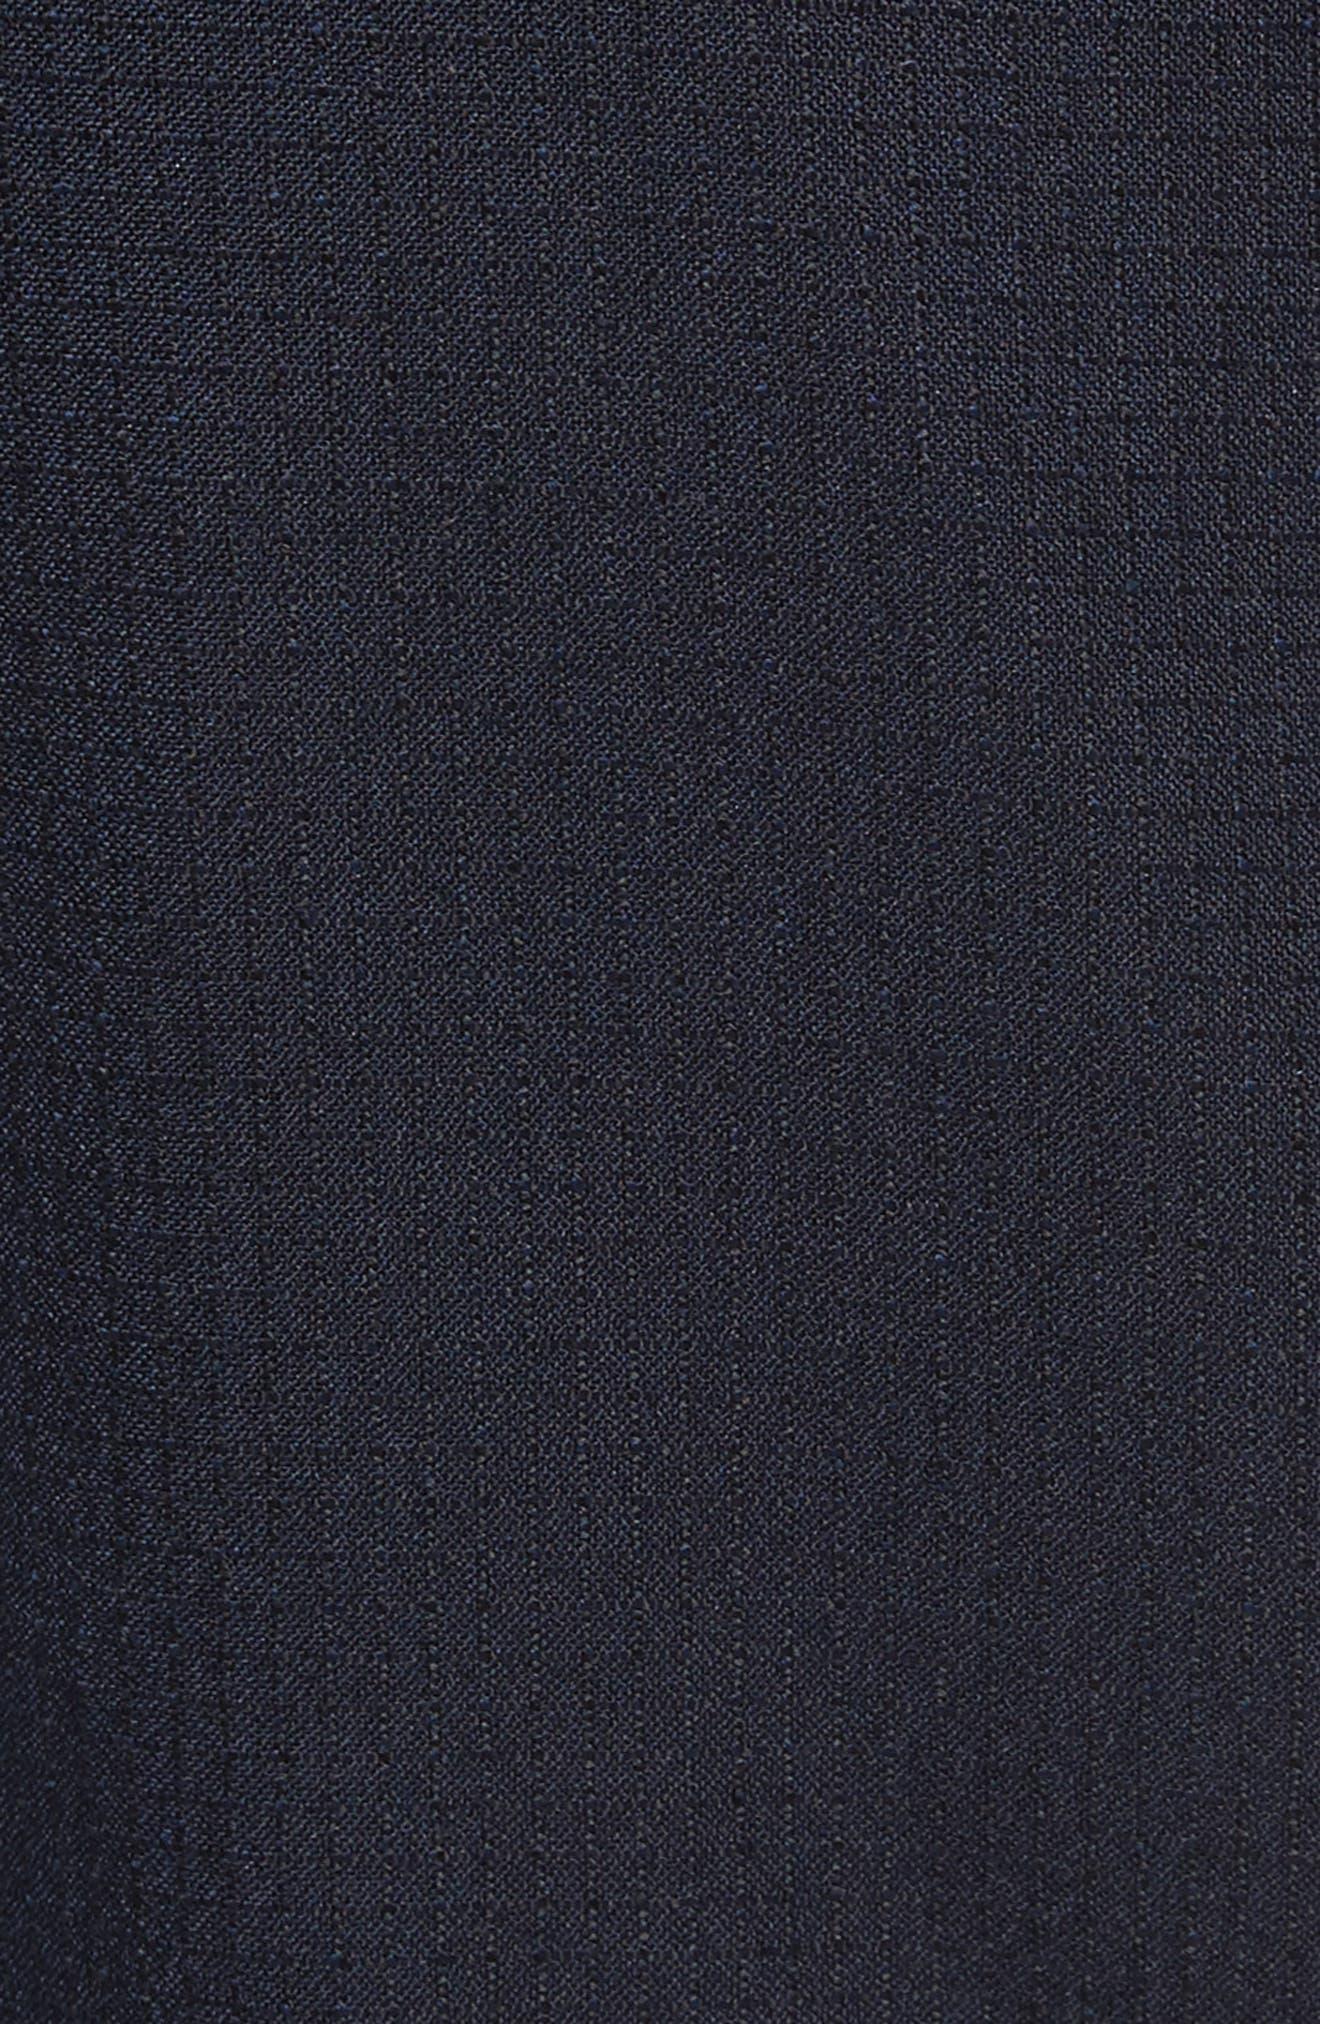 Wool & Silk Jogger Pants,                             Alternate thumbnail 2, color,                             435